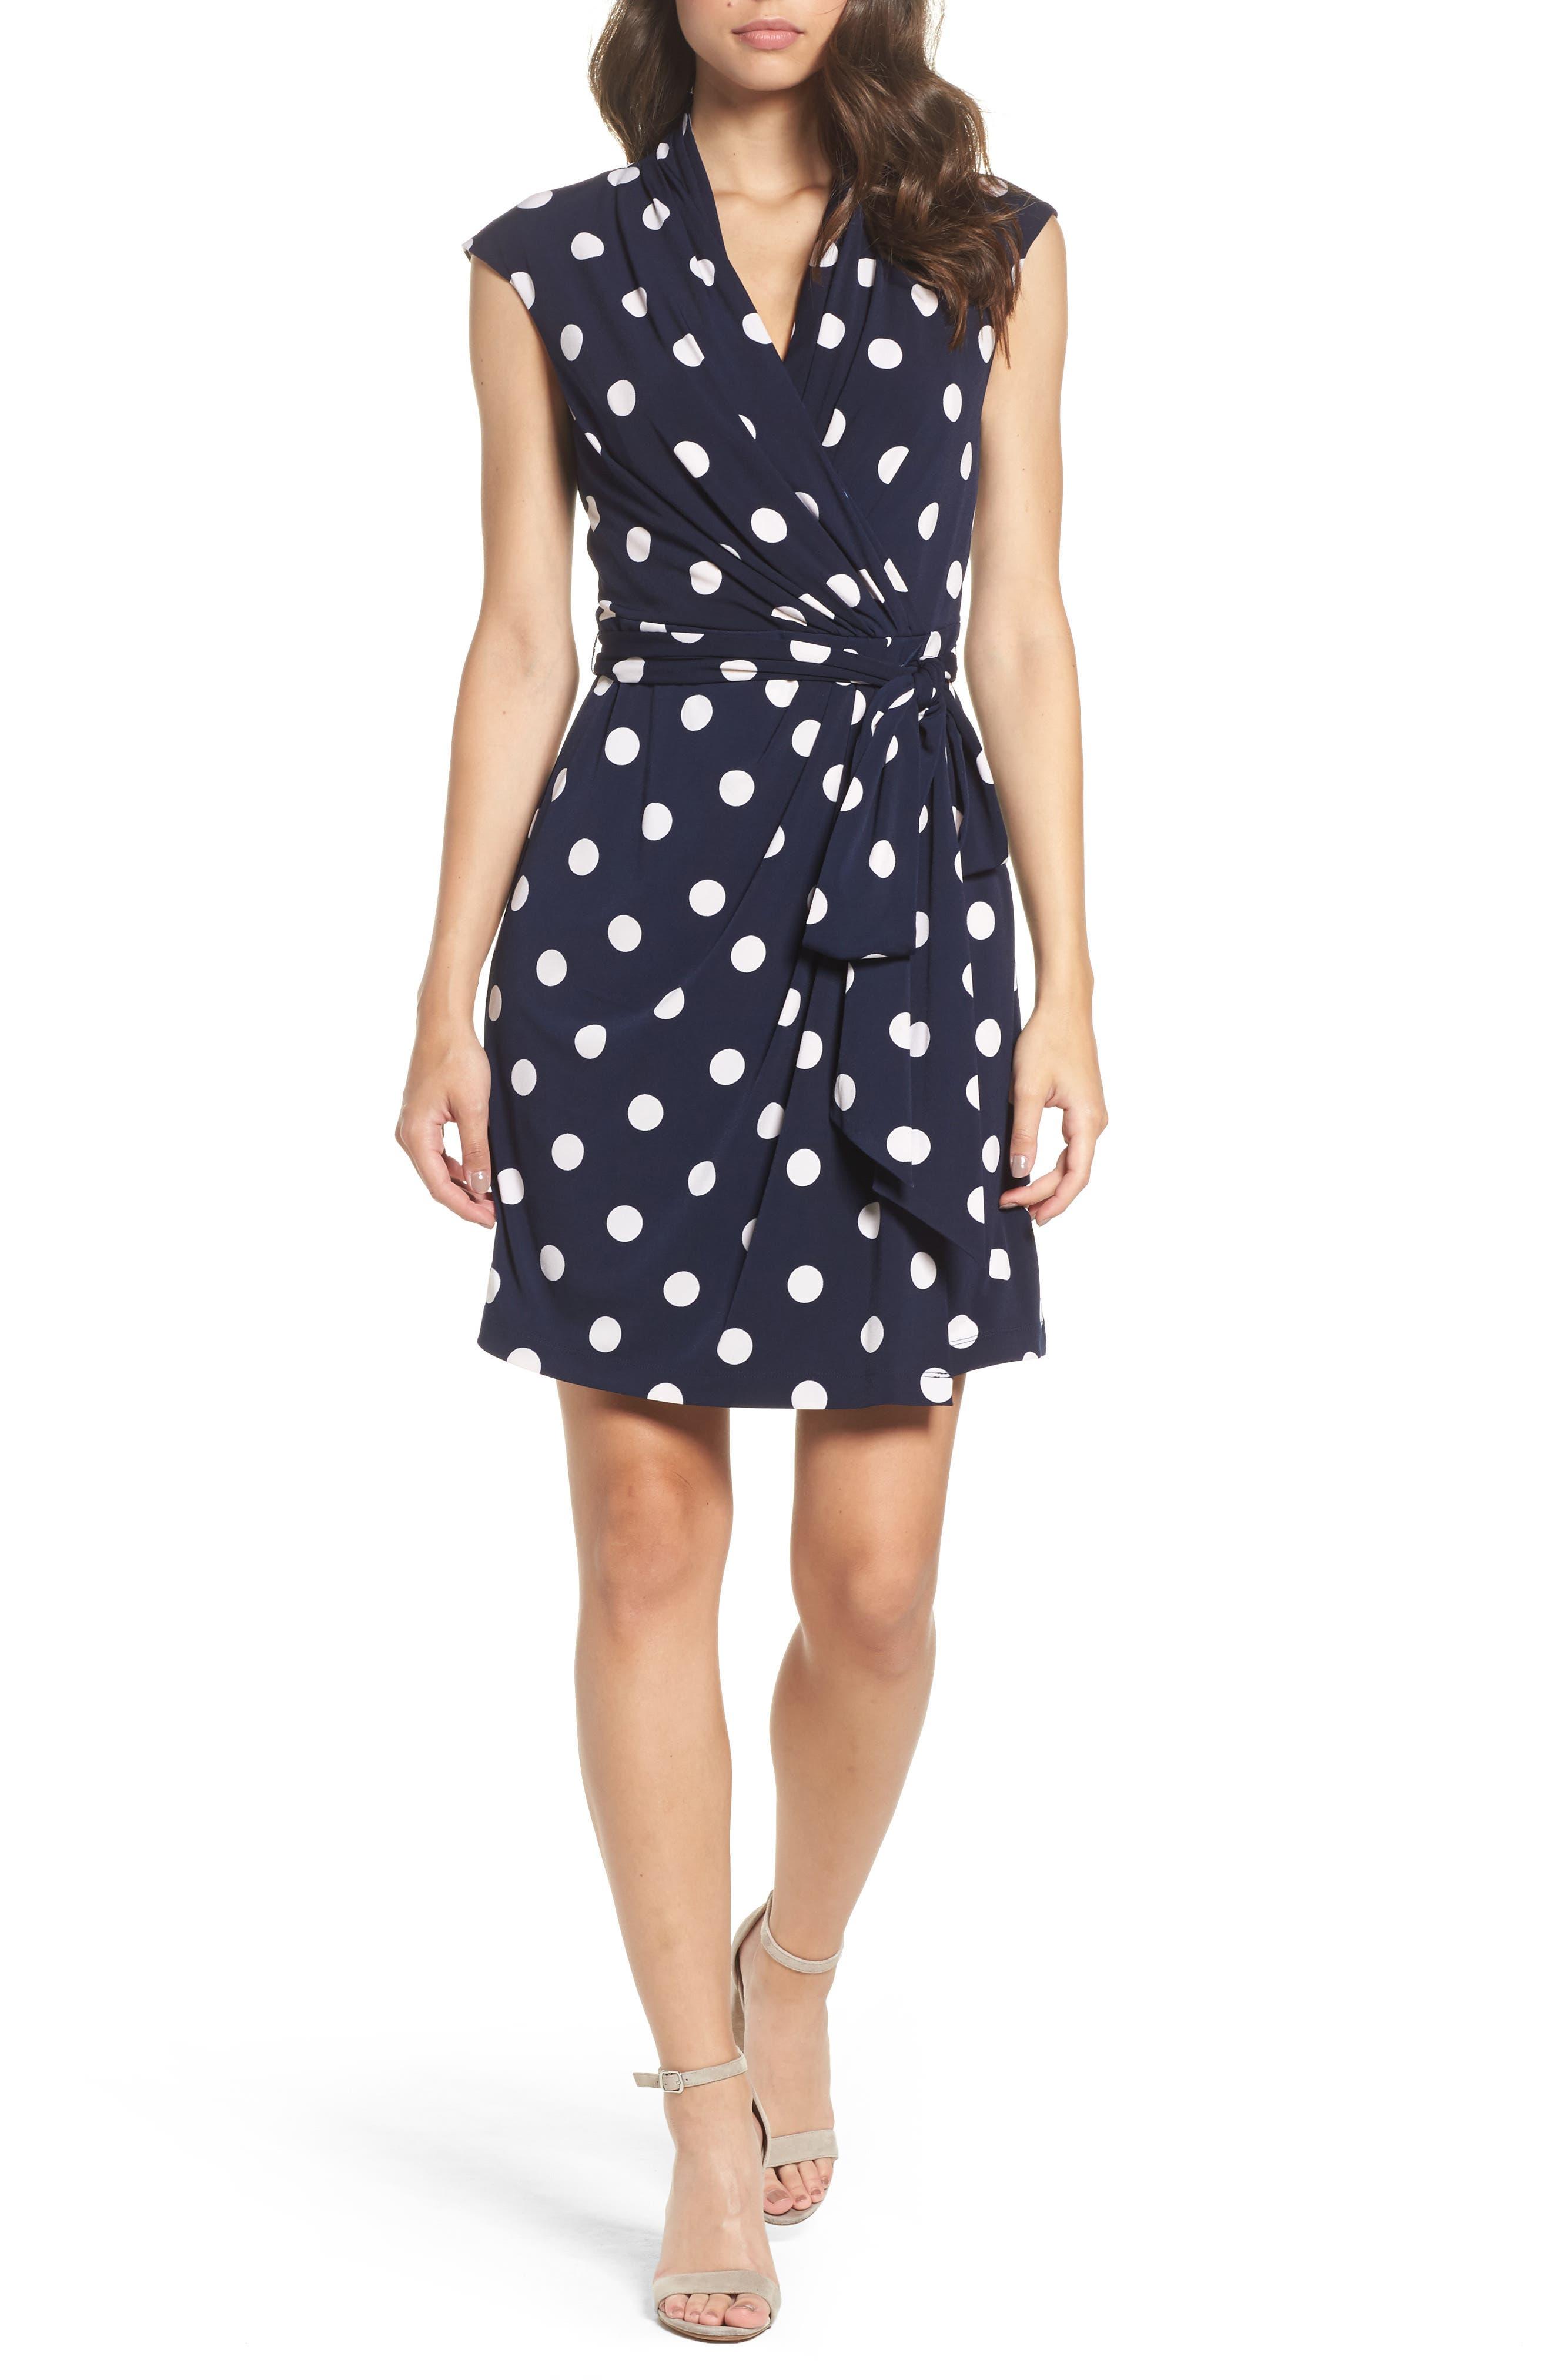 Alternate Image 1 Selected - Eliza J Polka Dot Jersey Faux Wrap Dress (Regular & Petite)